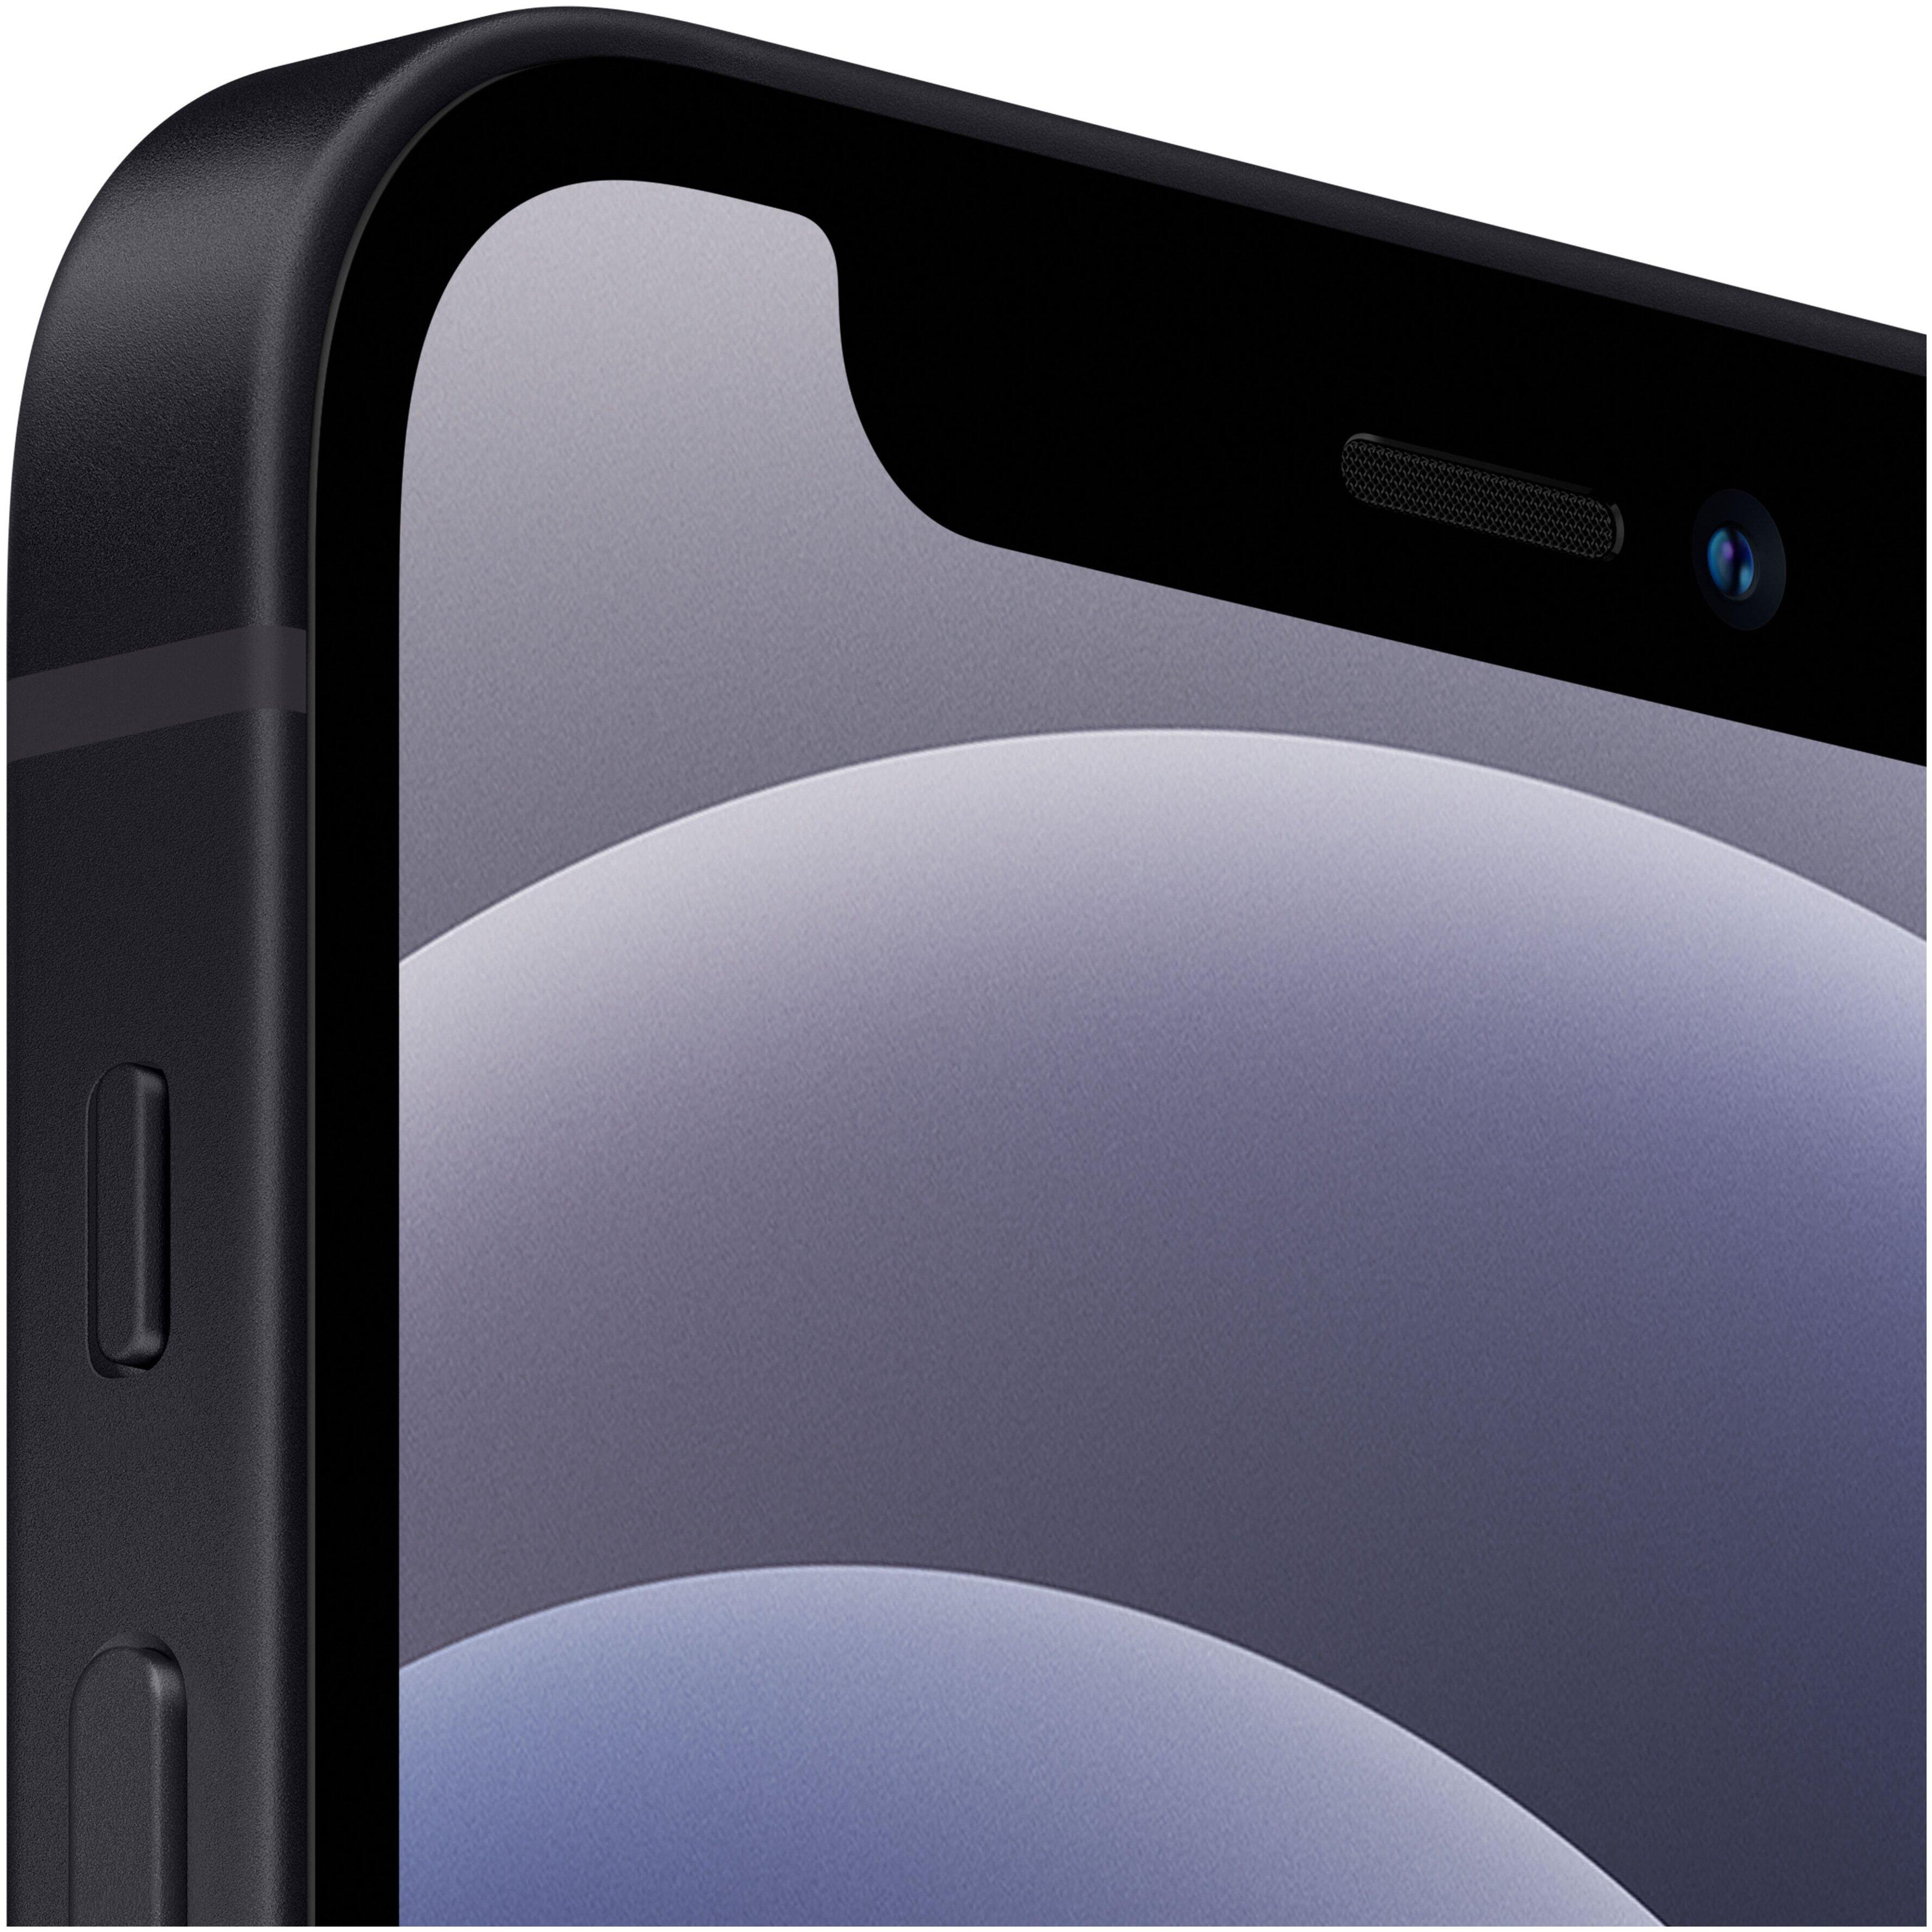 Apple iPhone 12 mini 256GB - интернет: 4G LTE, 5G